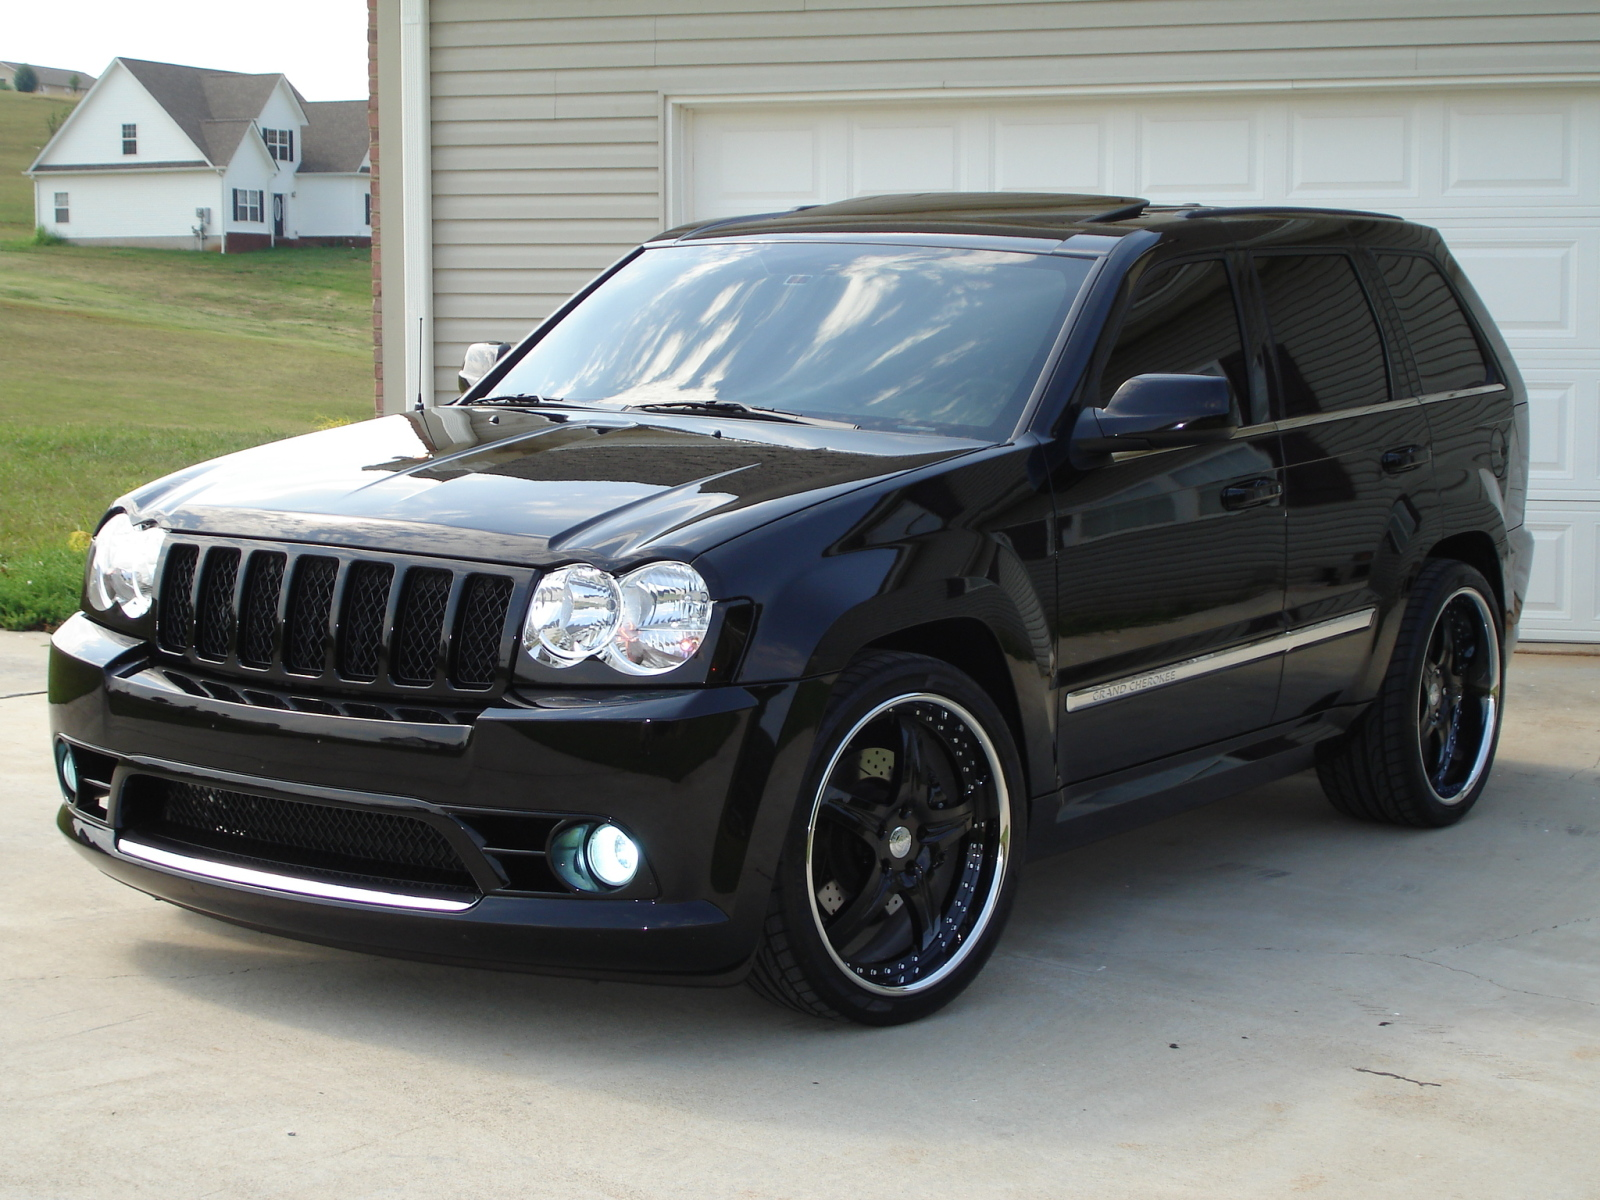 2006-jeep-grand-cherokee-srt8-pic-41810.jpeg